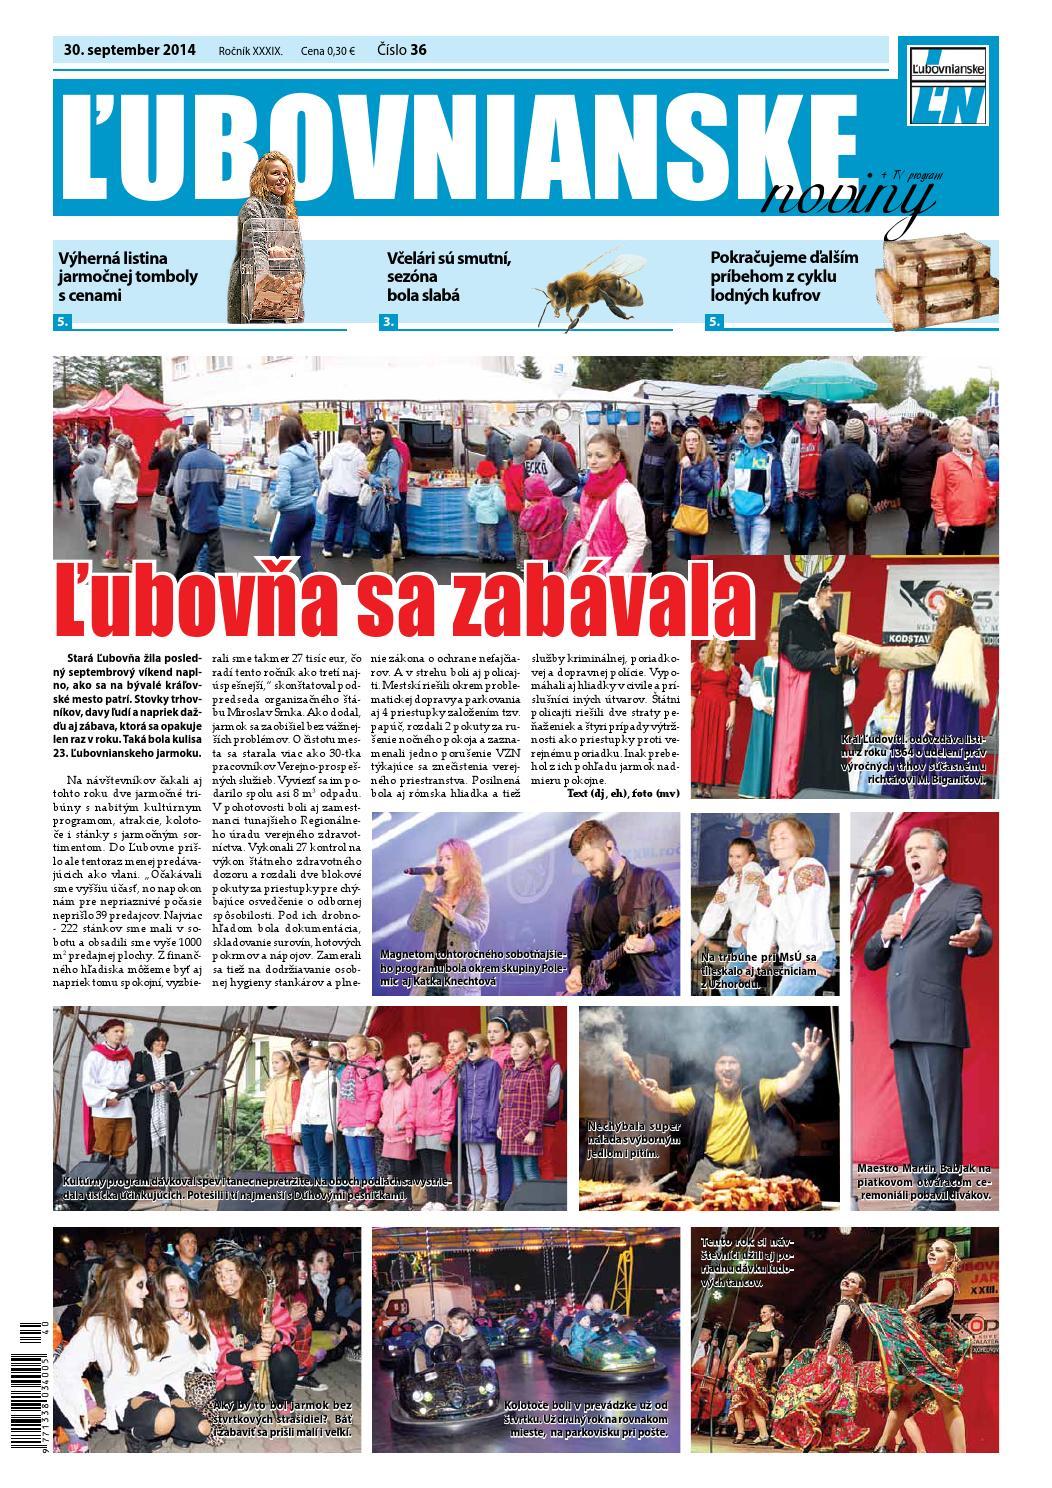 Ľubovnianske noviny č. 36 by Vladimir Zima - issuu a820aa0ee8c